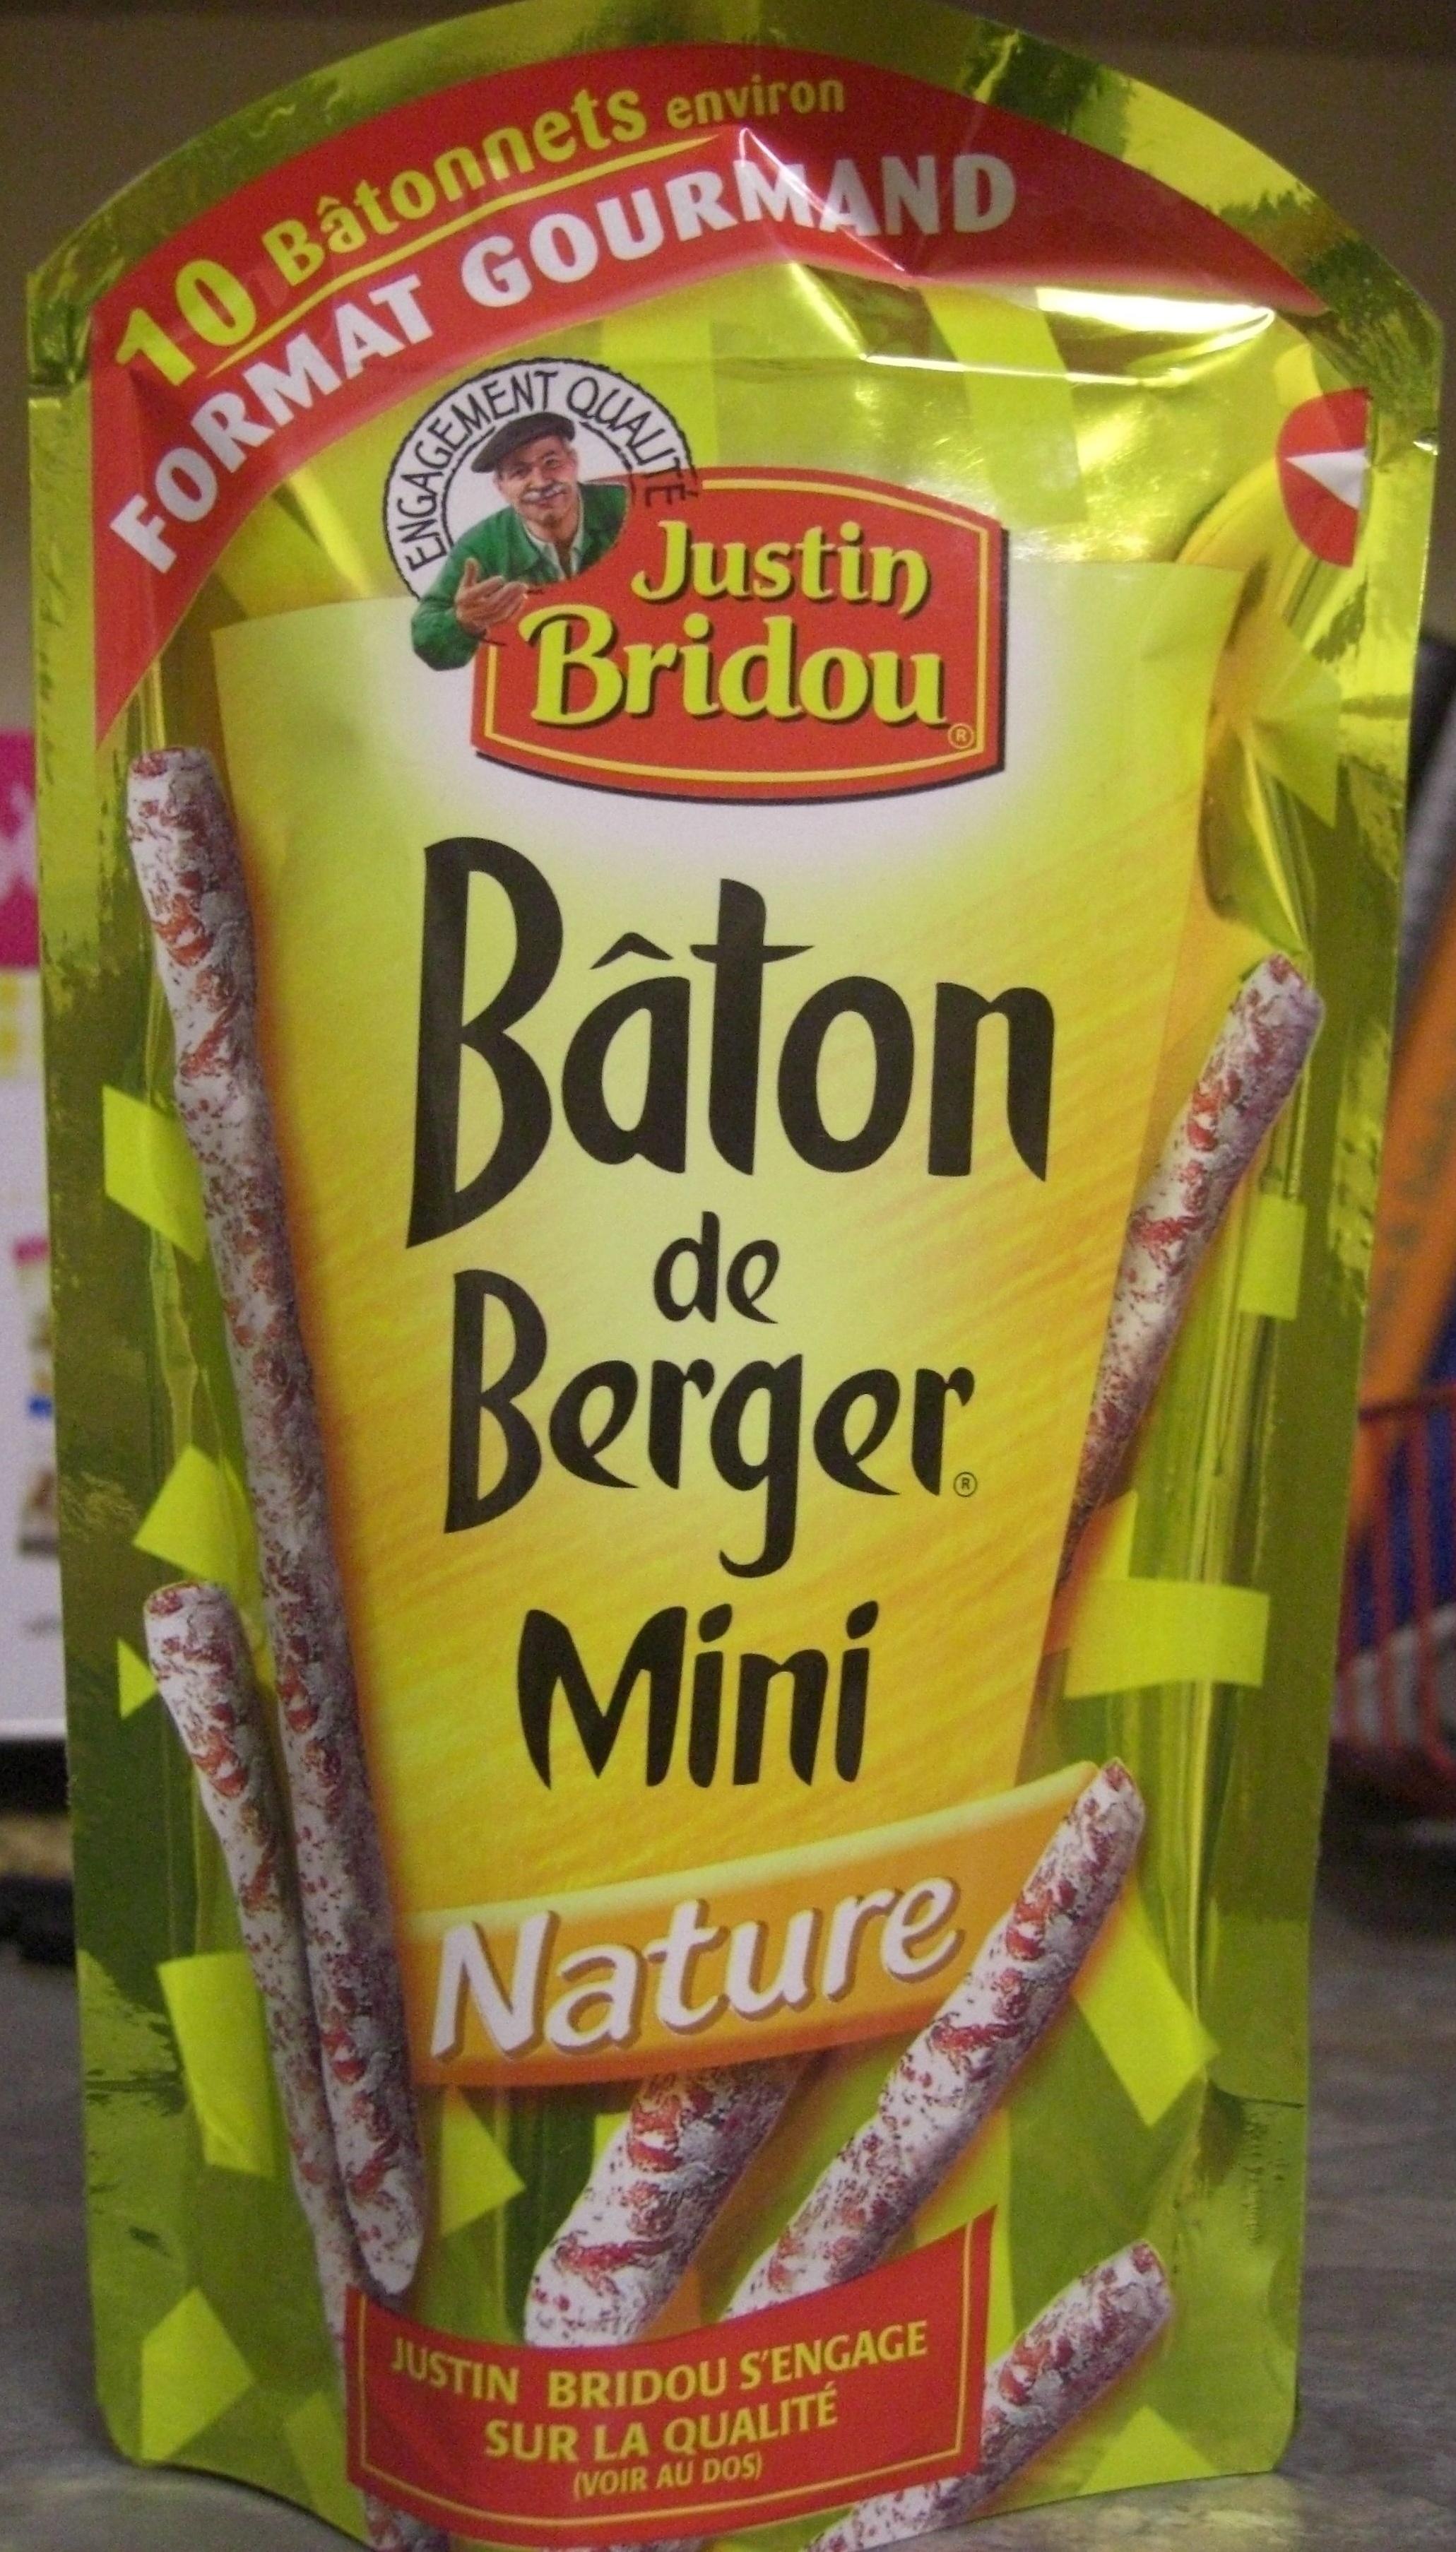 Bâton de Berger Mini Nature (Format Gourmand, 10 Bâtonnets environ) - Product - fr